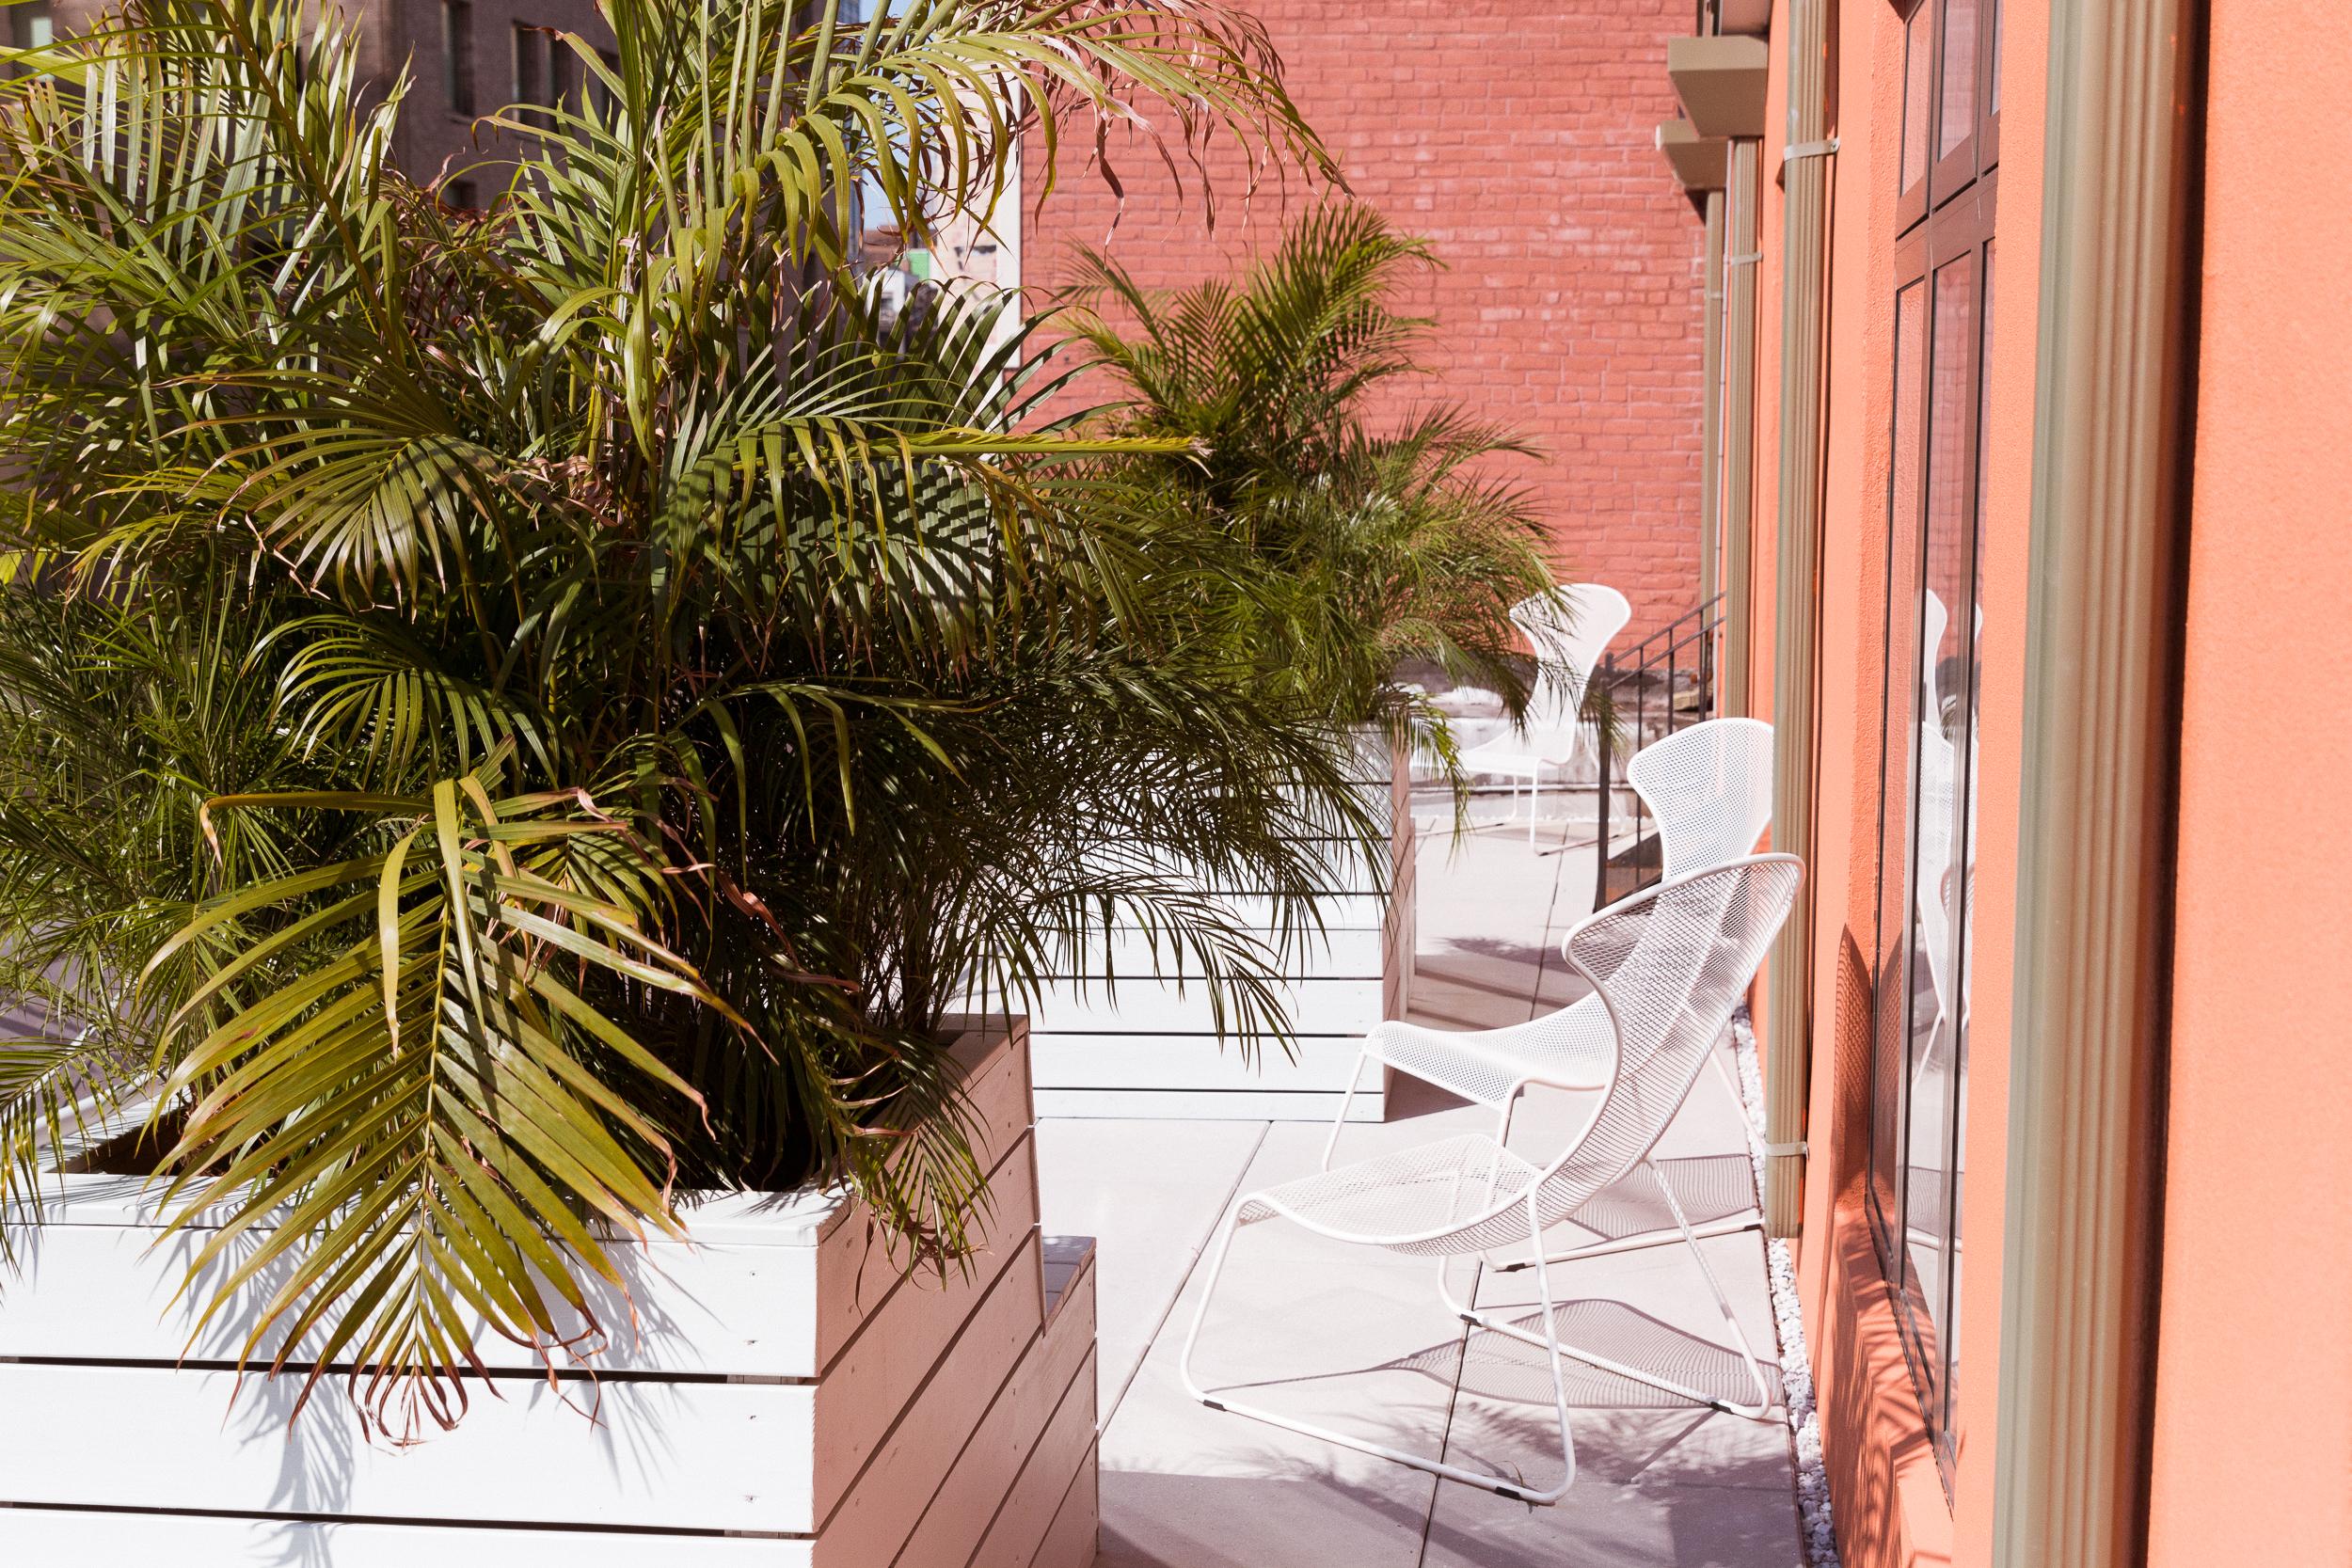 Glossier's balcony